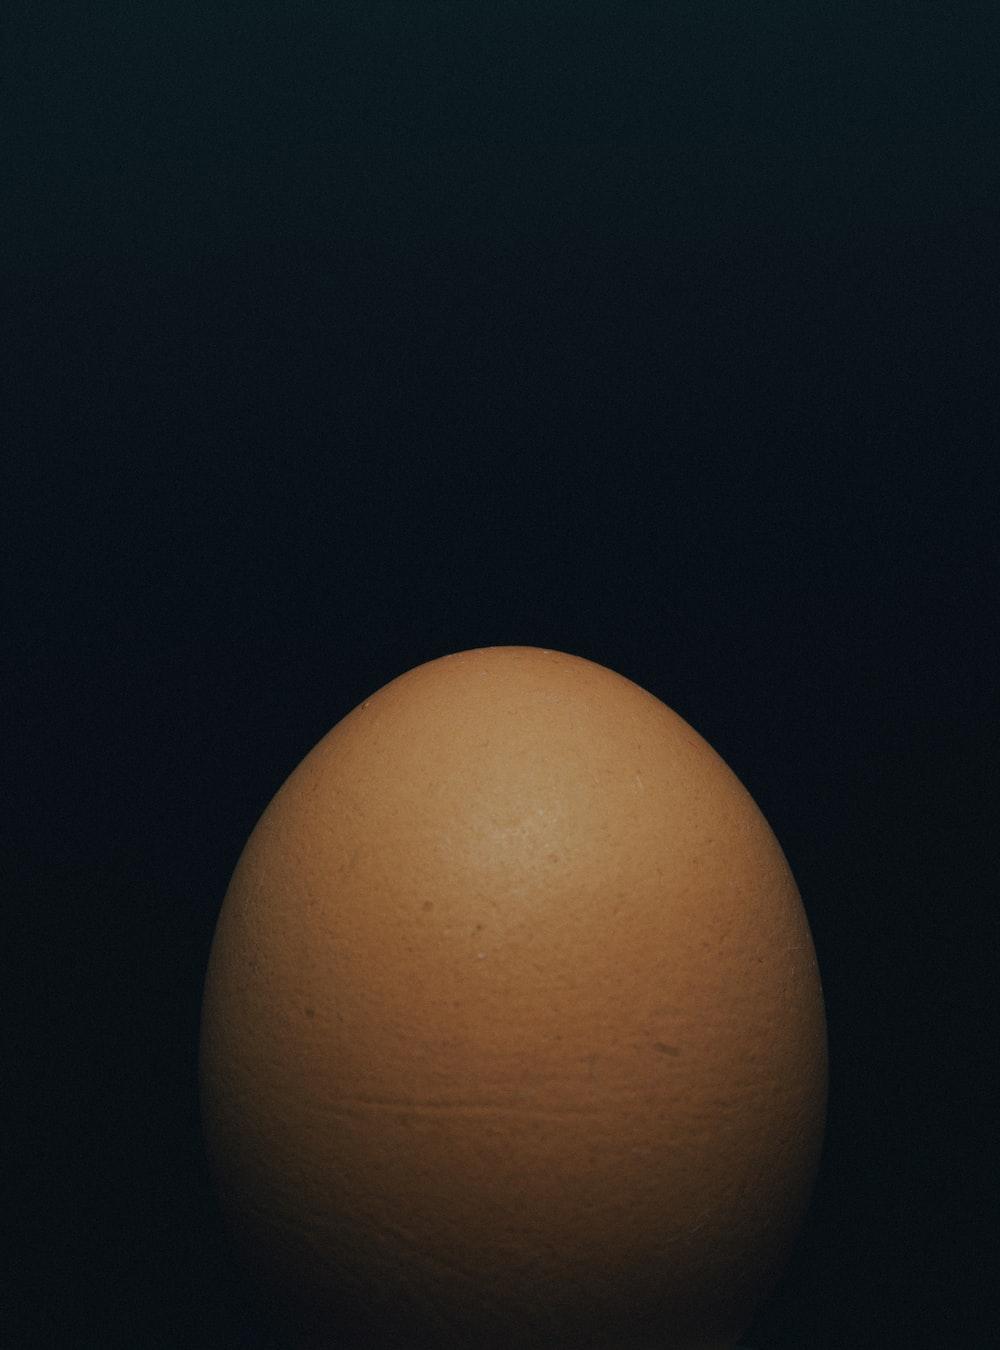 brown egg decor